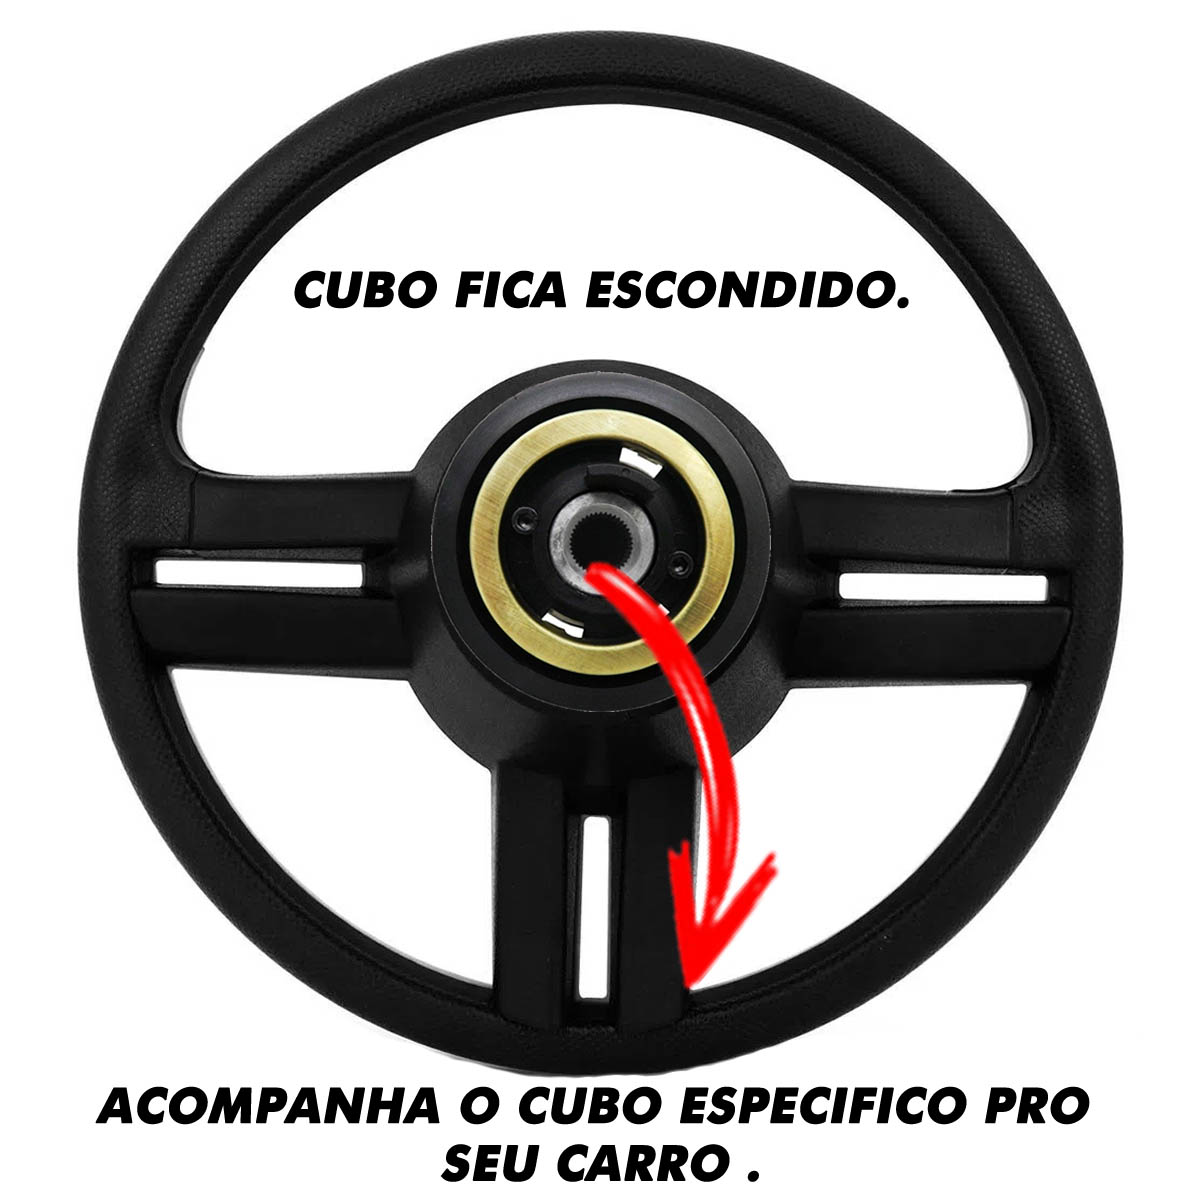 Volante Ford Surf Rallye Esportivo Cubo Fiesta Ka Ecosport Escort Hobby Zetec F100 F1000 F75 F250 Poliparts